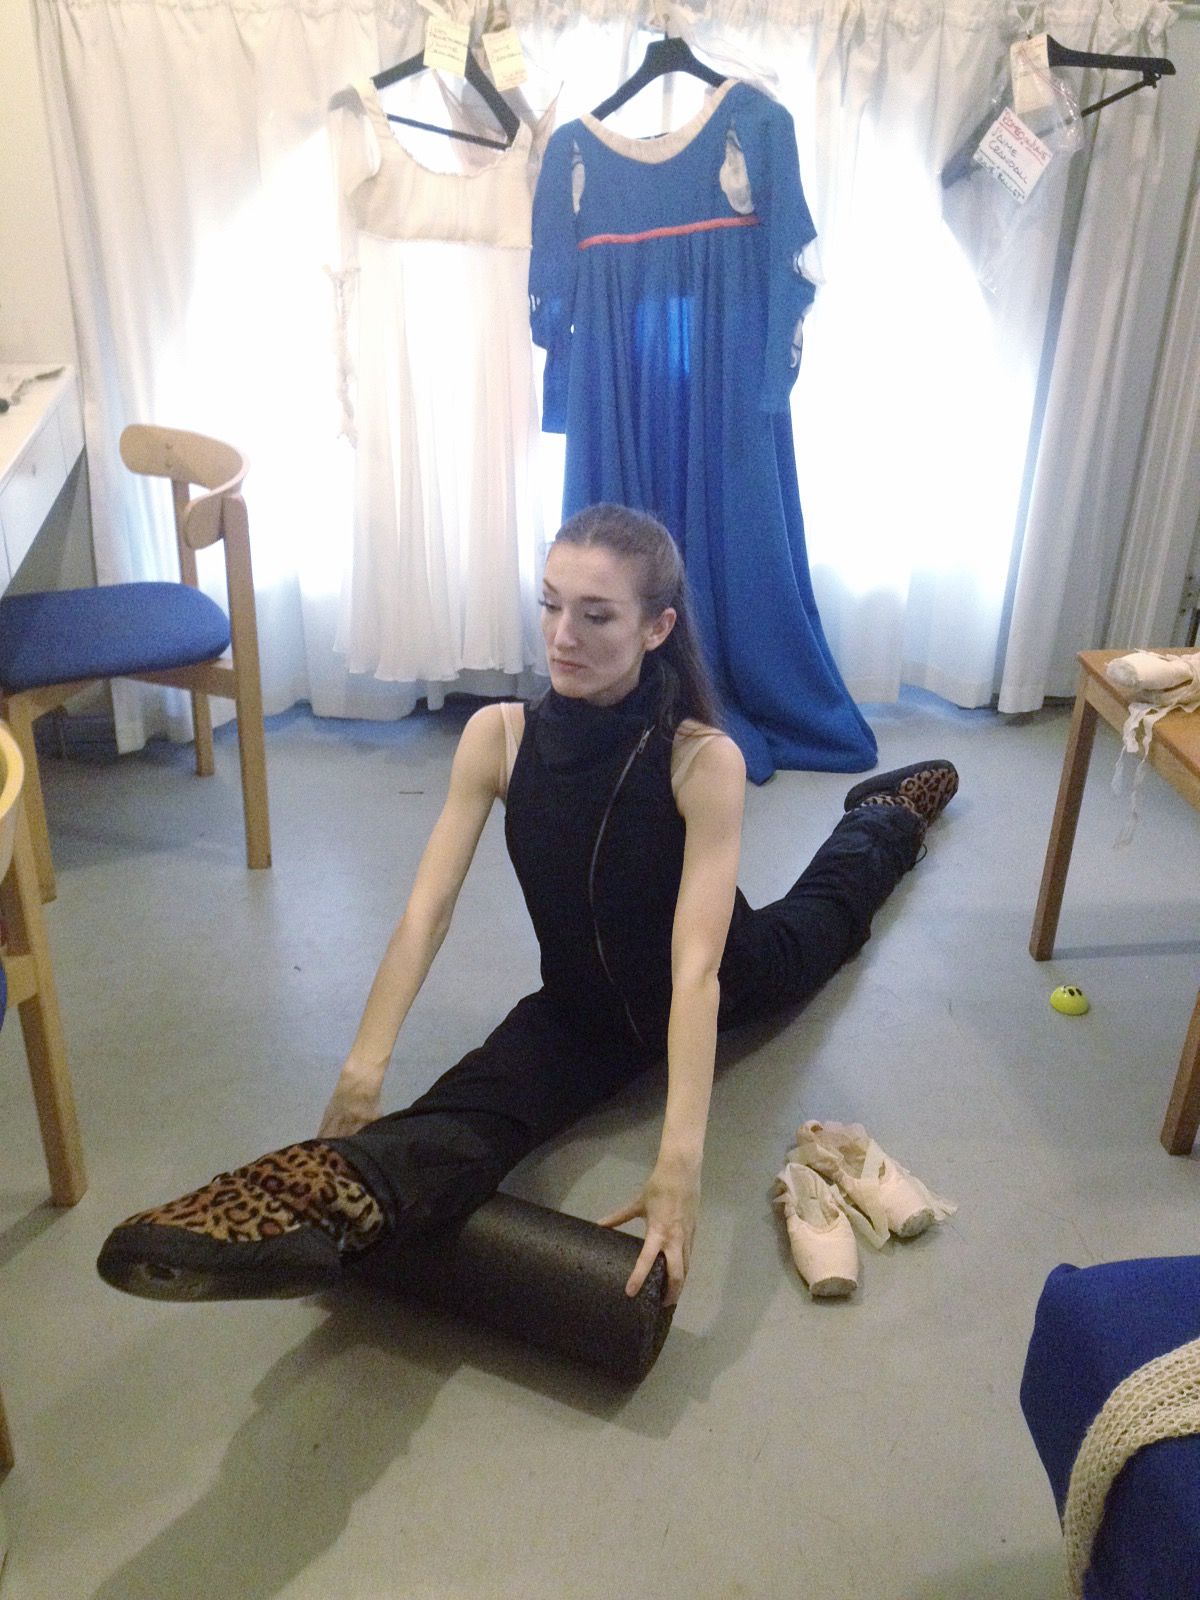 JULIET. Merde to #JaimeCrandall on her premiere as Juliet with the #RoyalDanishBallet // #OdileVest #Ballerina #Stretch #Fashion #Style